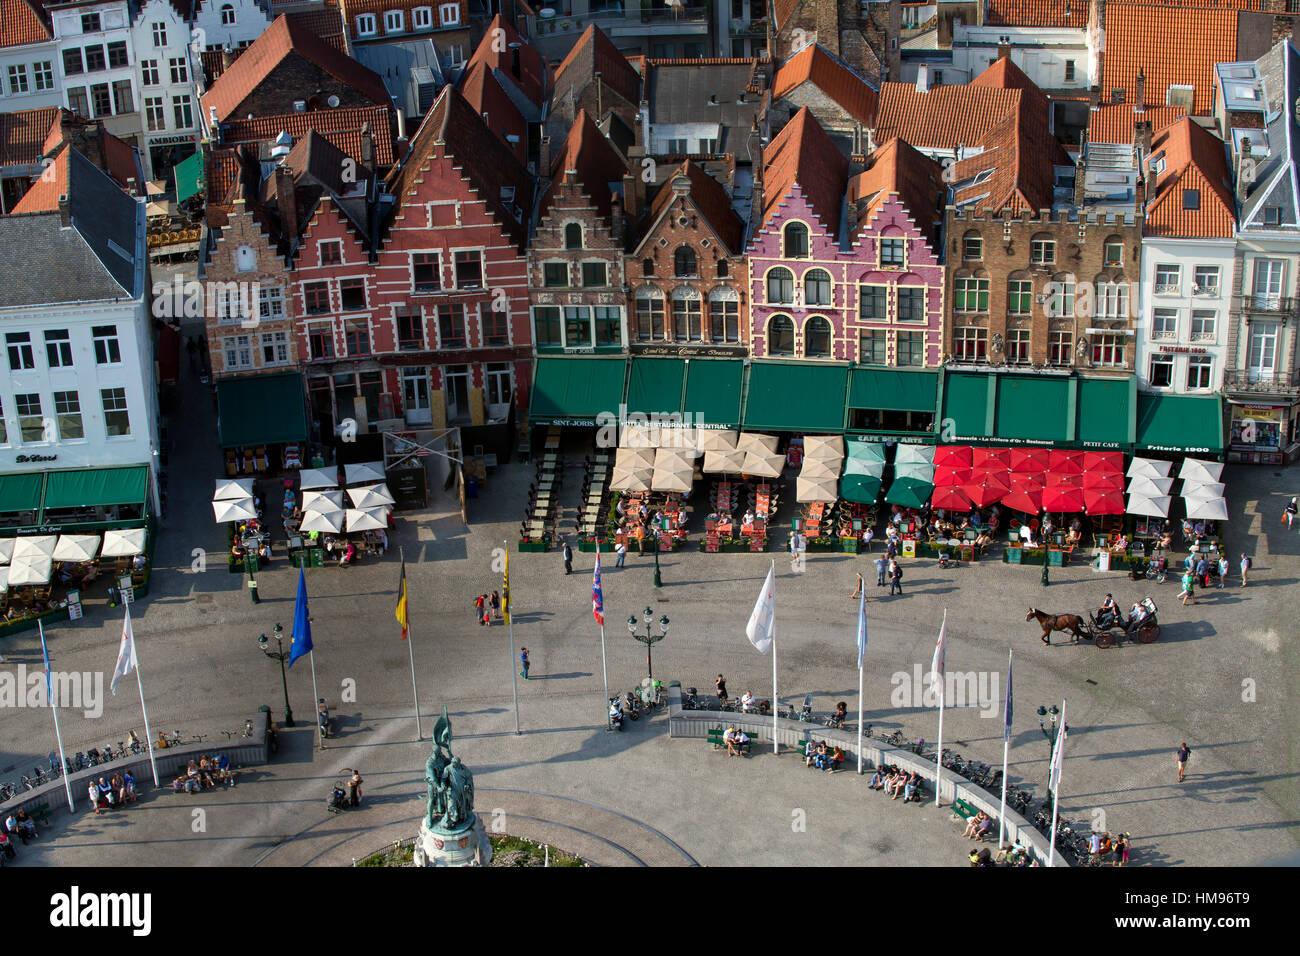 Markt Square seen from the top of Belfry Tower(Belfort Tower), Bruges, West Flanders, Belgium - Stock Image